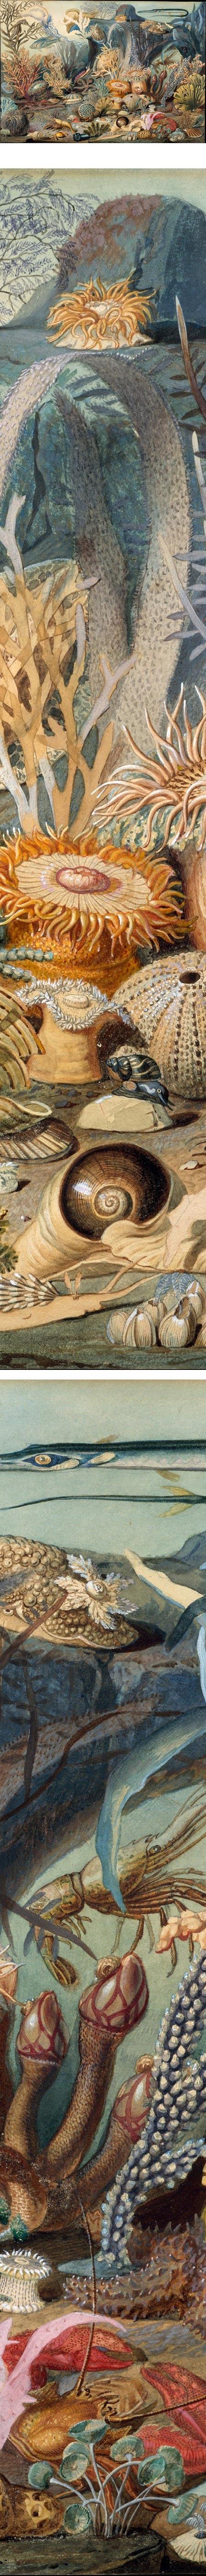 Ocean Life, Christian Schussele, watercolor and gouache